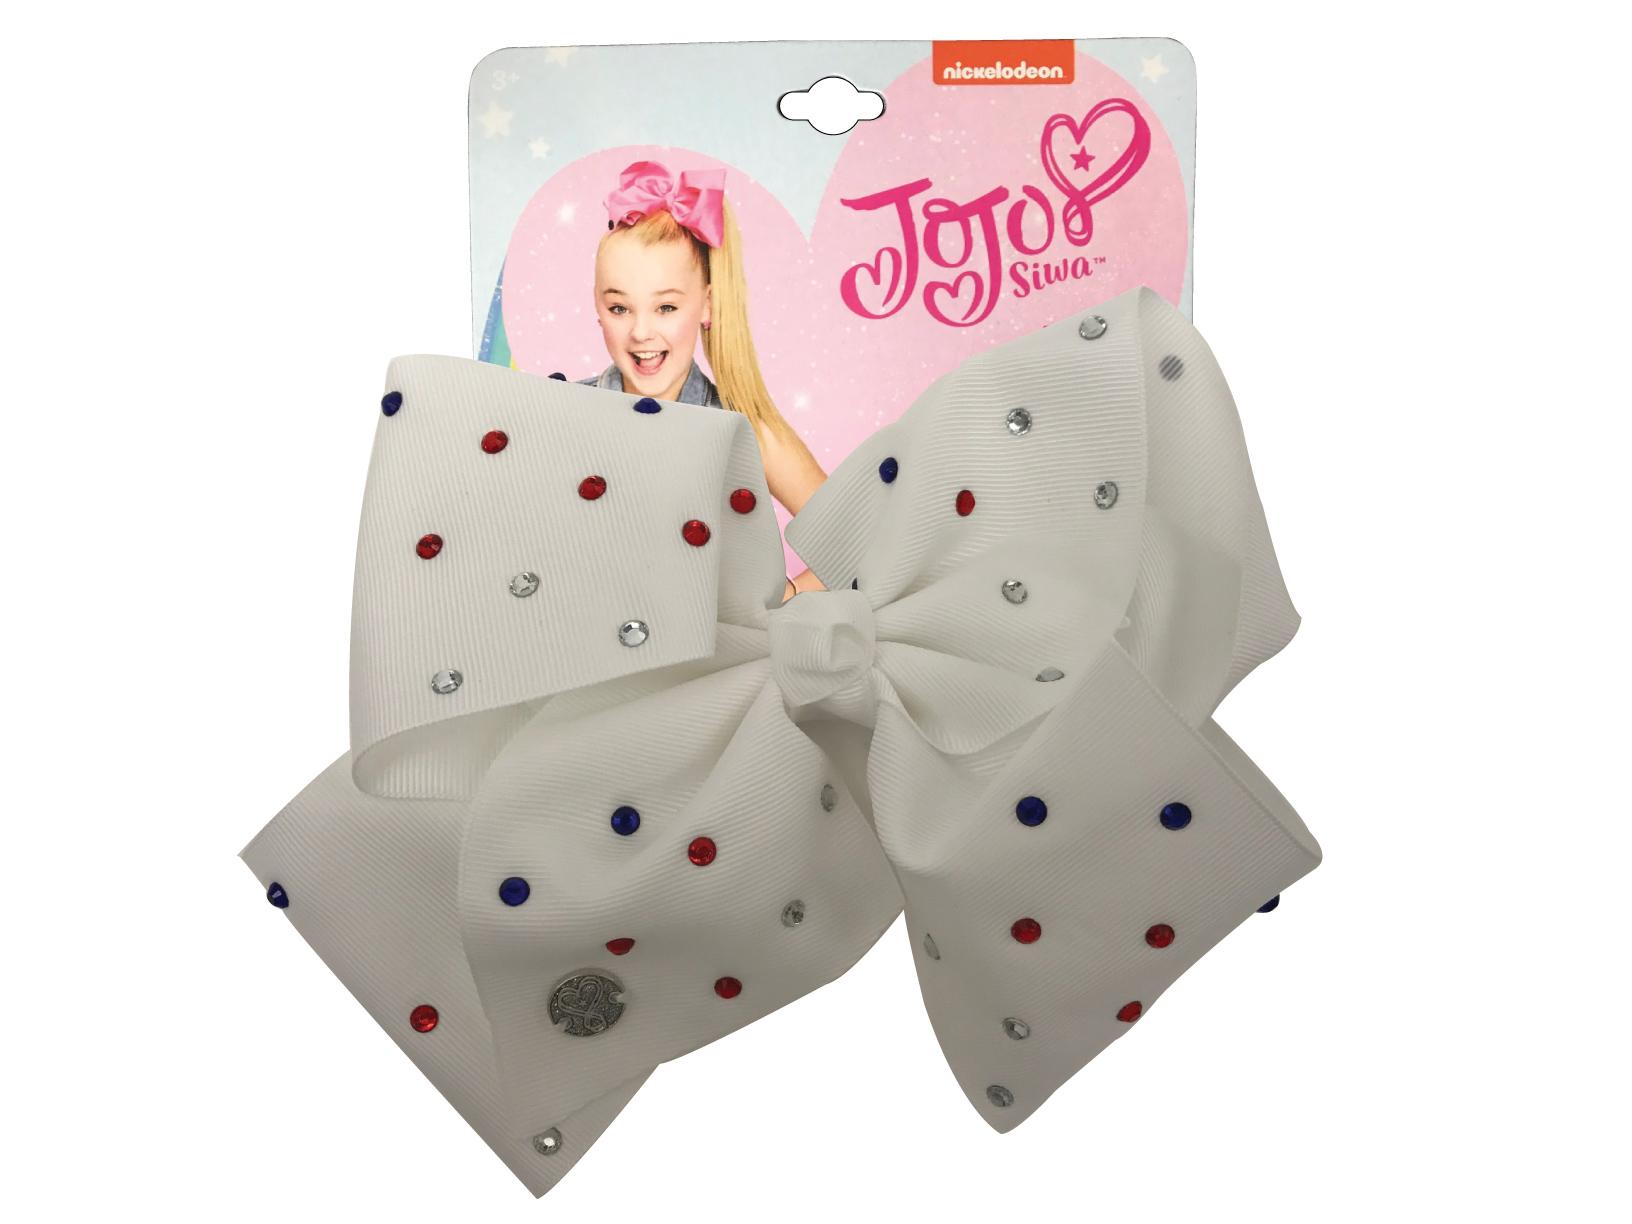 JoJo Siwa Large Cheer Hair Bow (White w/Colored Rhinestones)